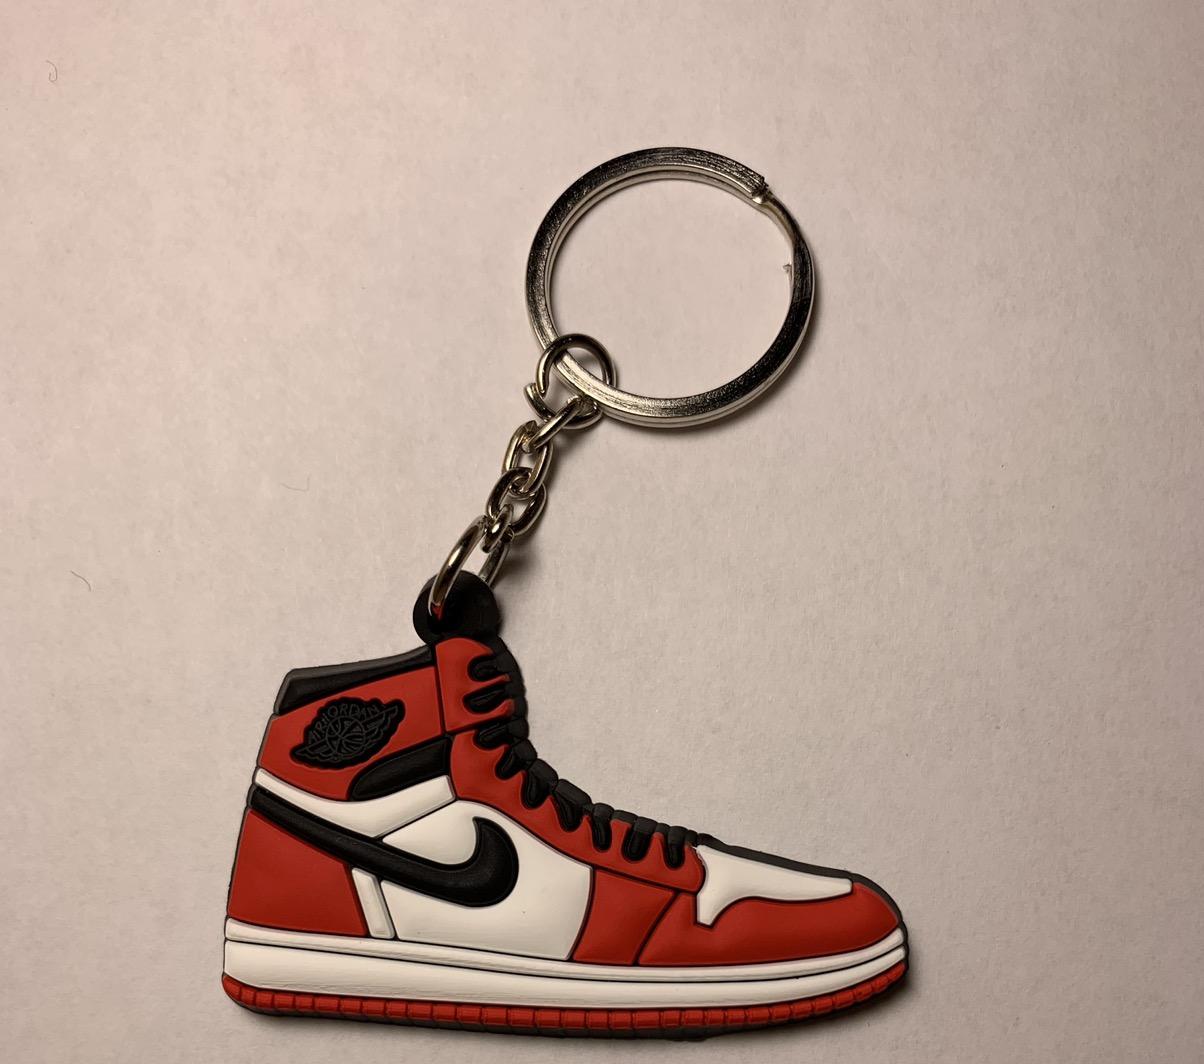 Jordan Brand Air jordan 1 Retro high og Chicago keychain